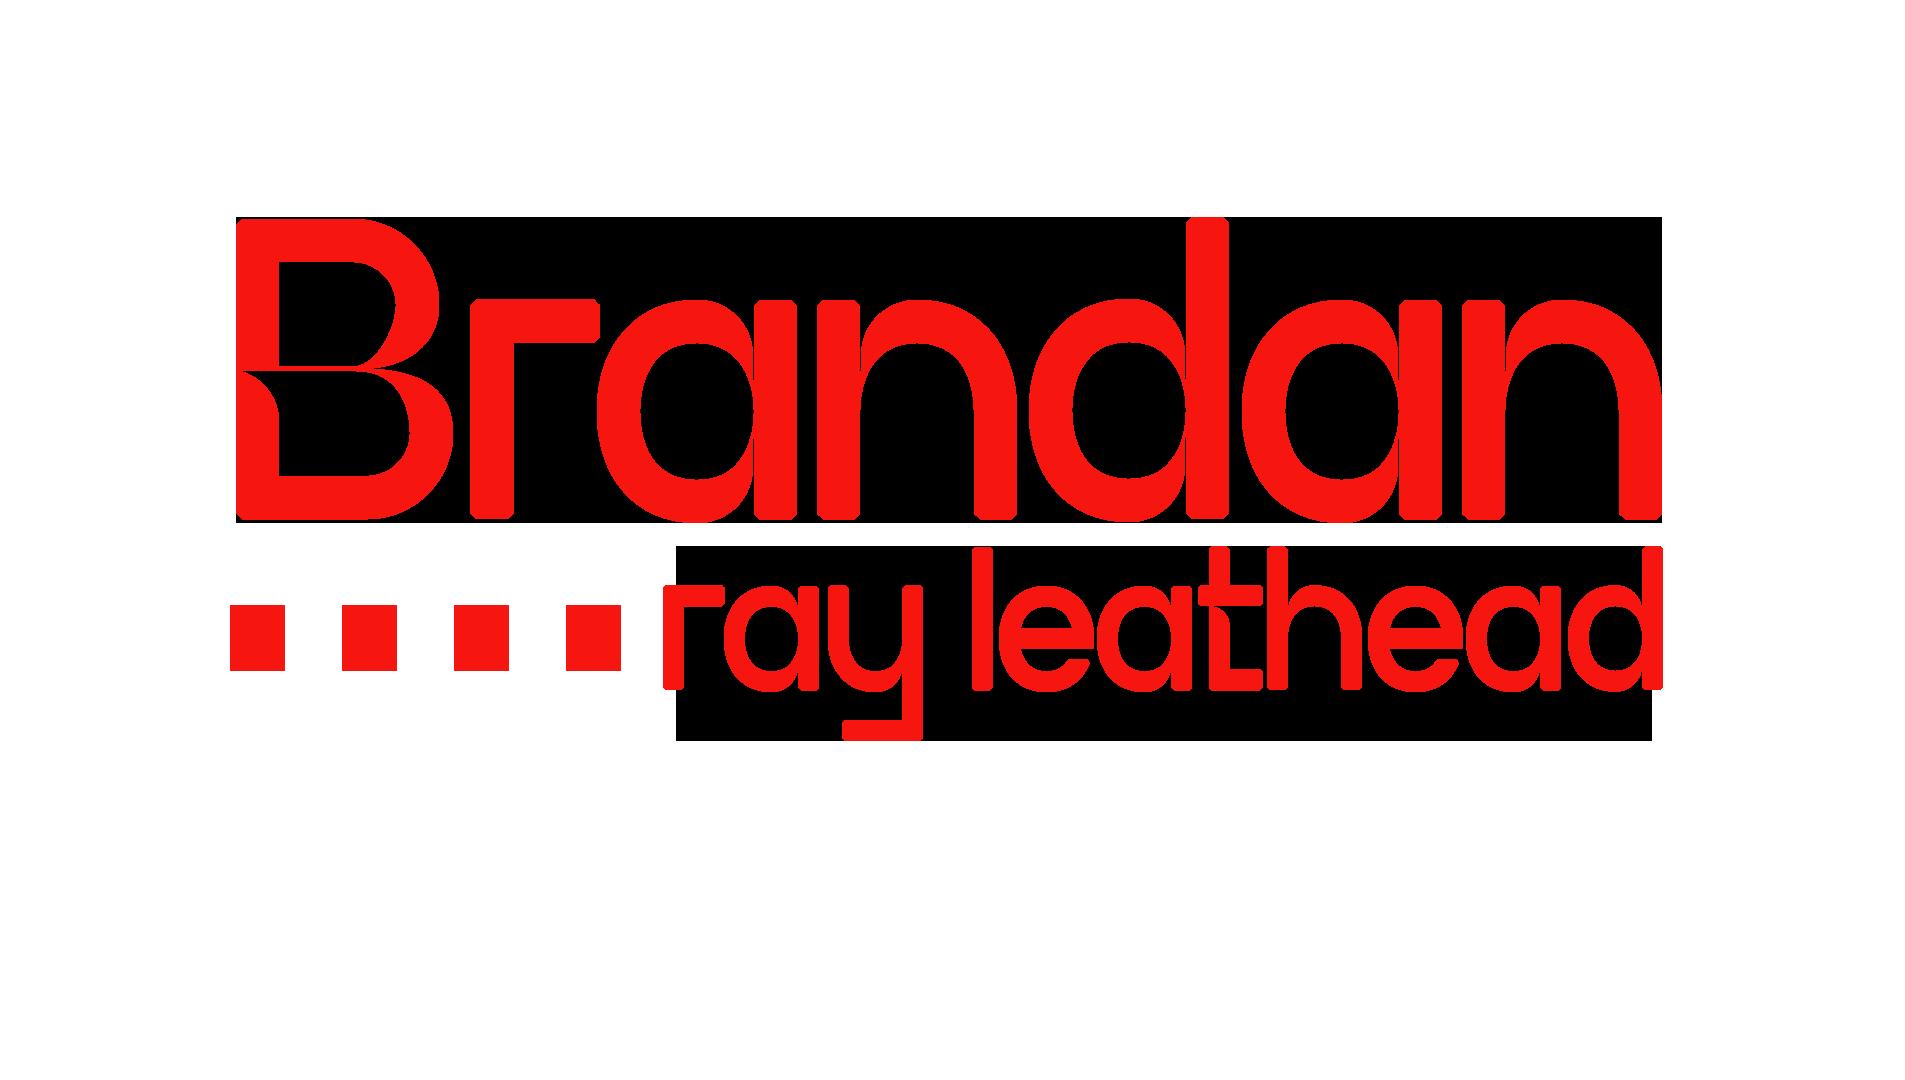 Brandan Leathead